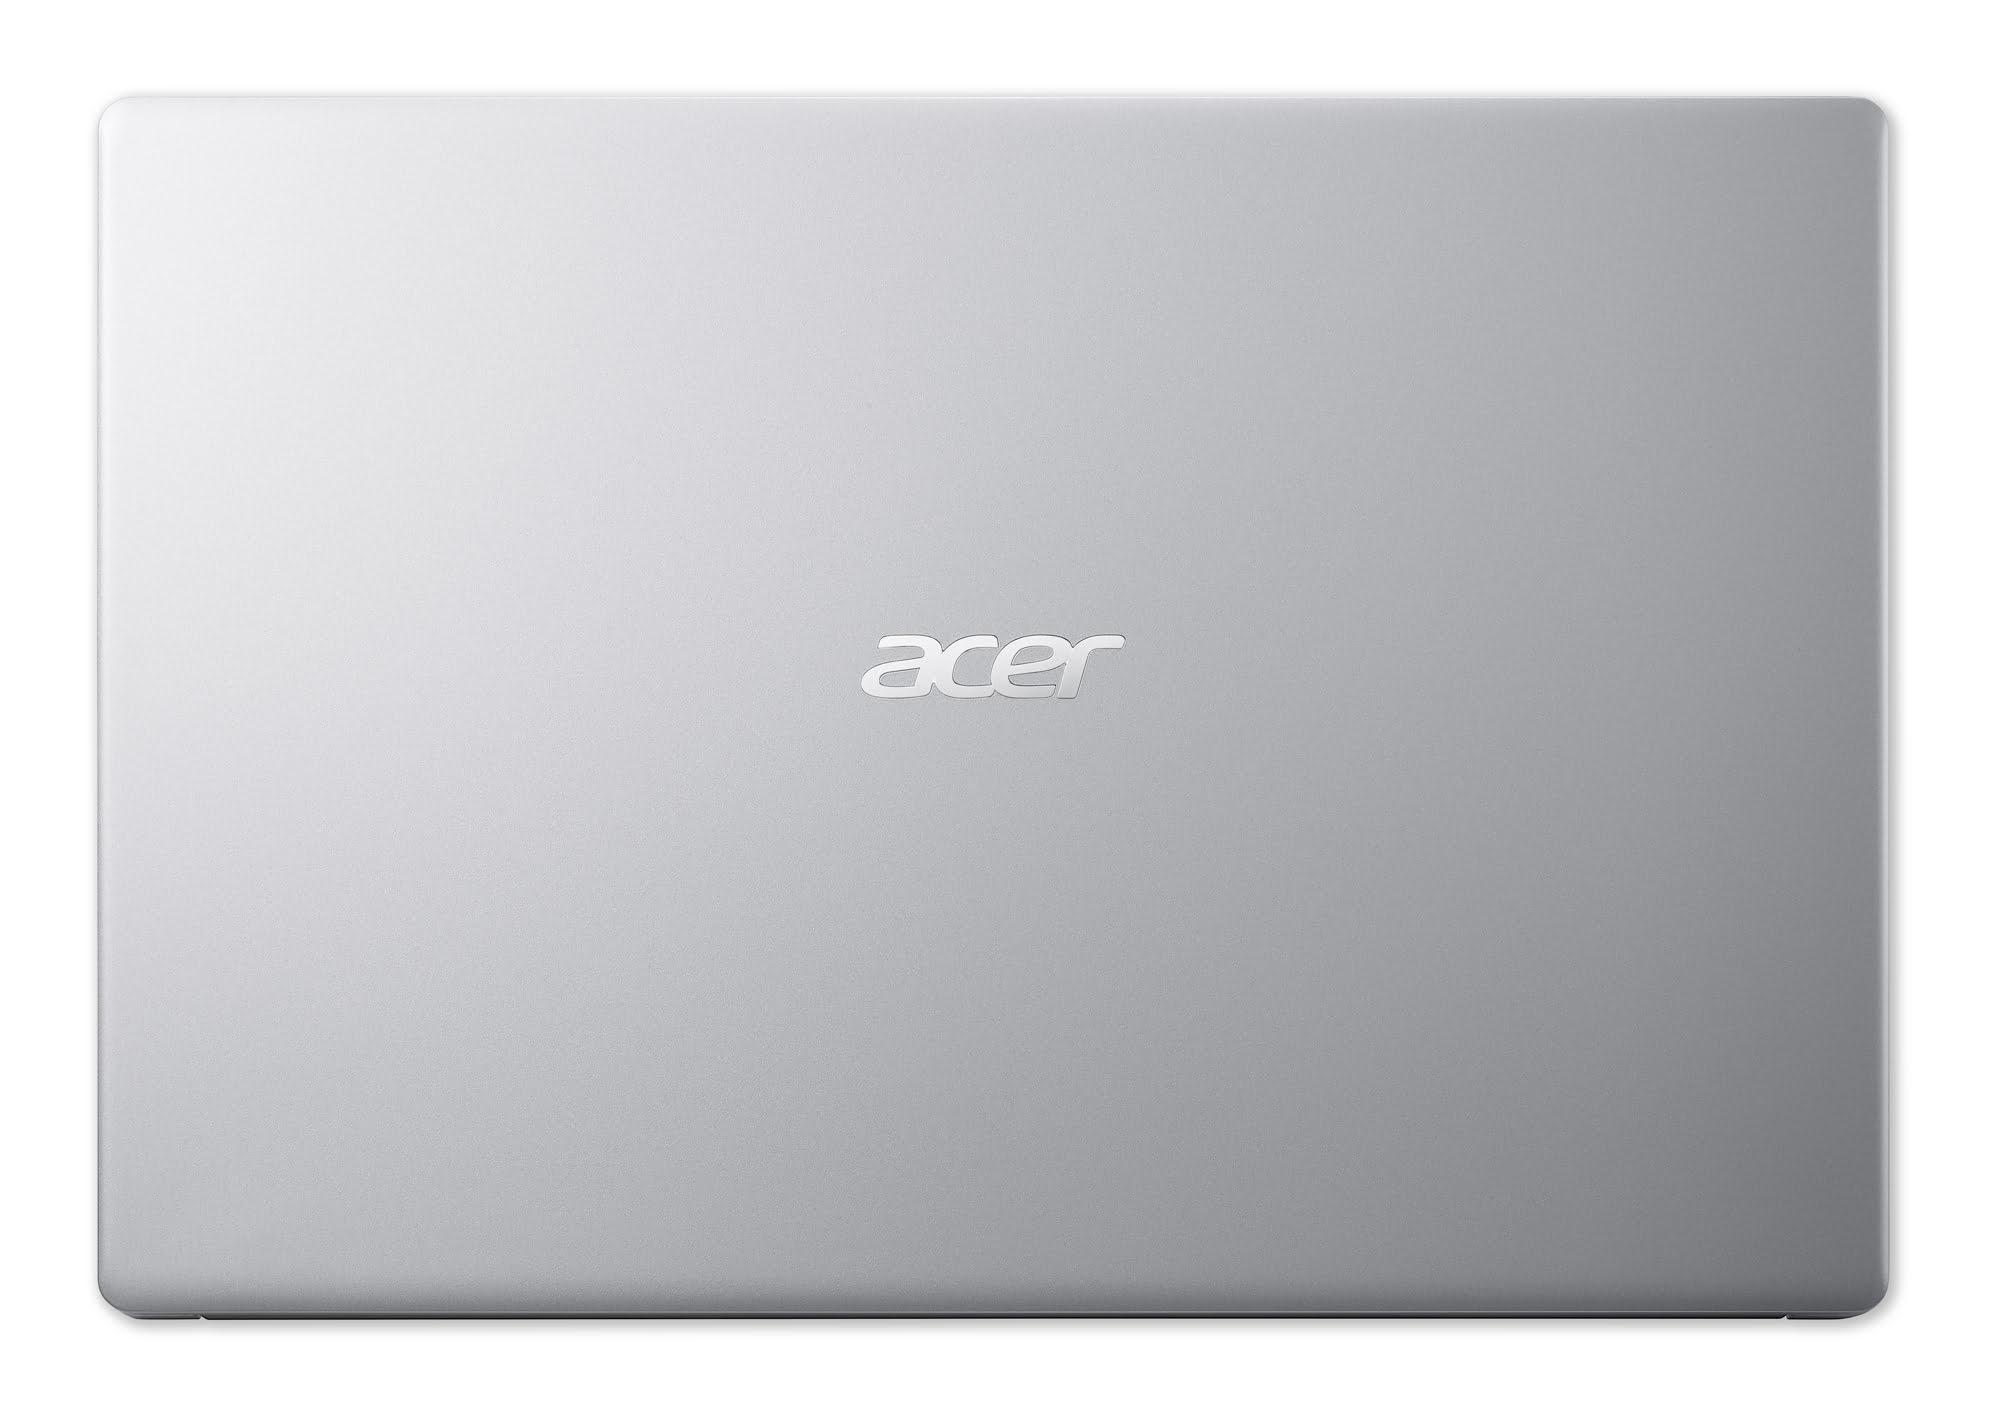 Acer NX.HVUEF.001 - PC portable Acer - Cybertek.fr - 1